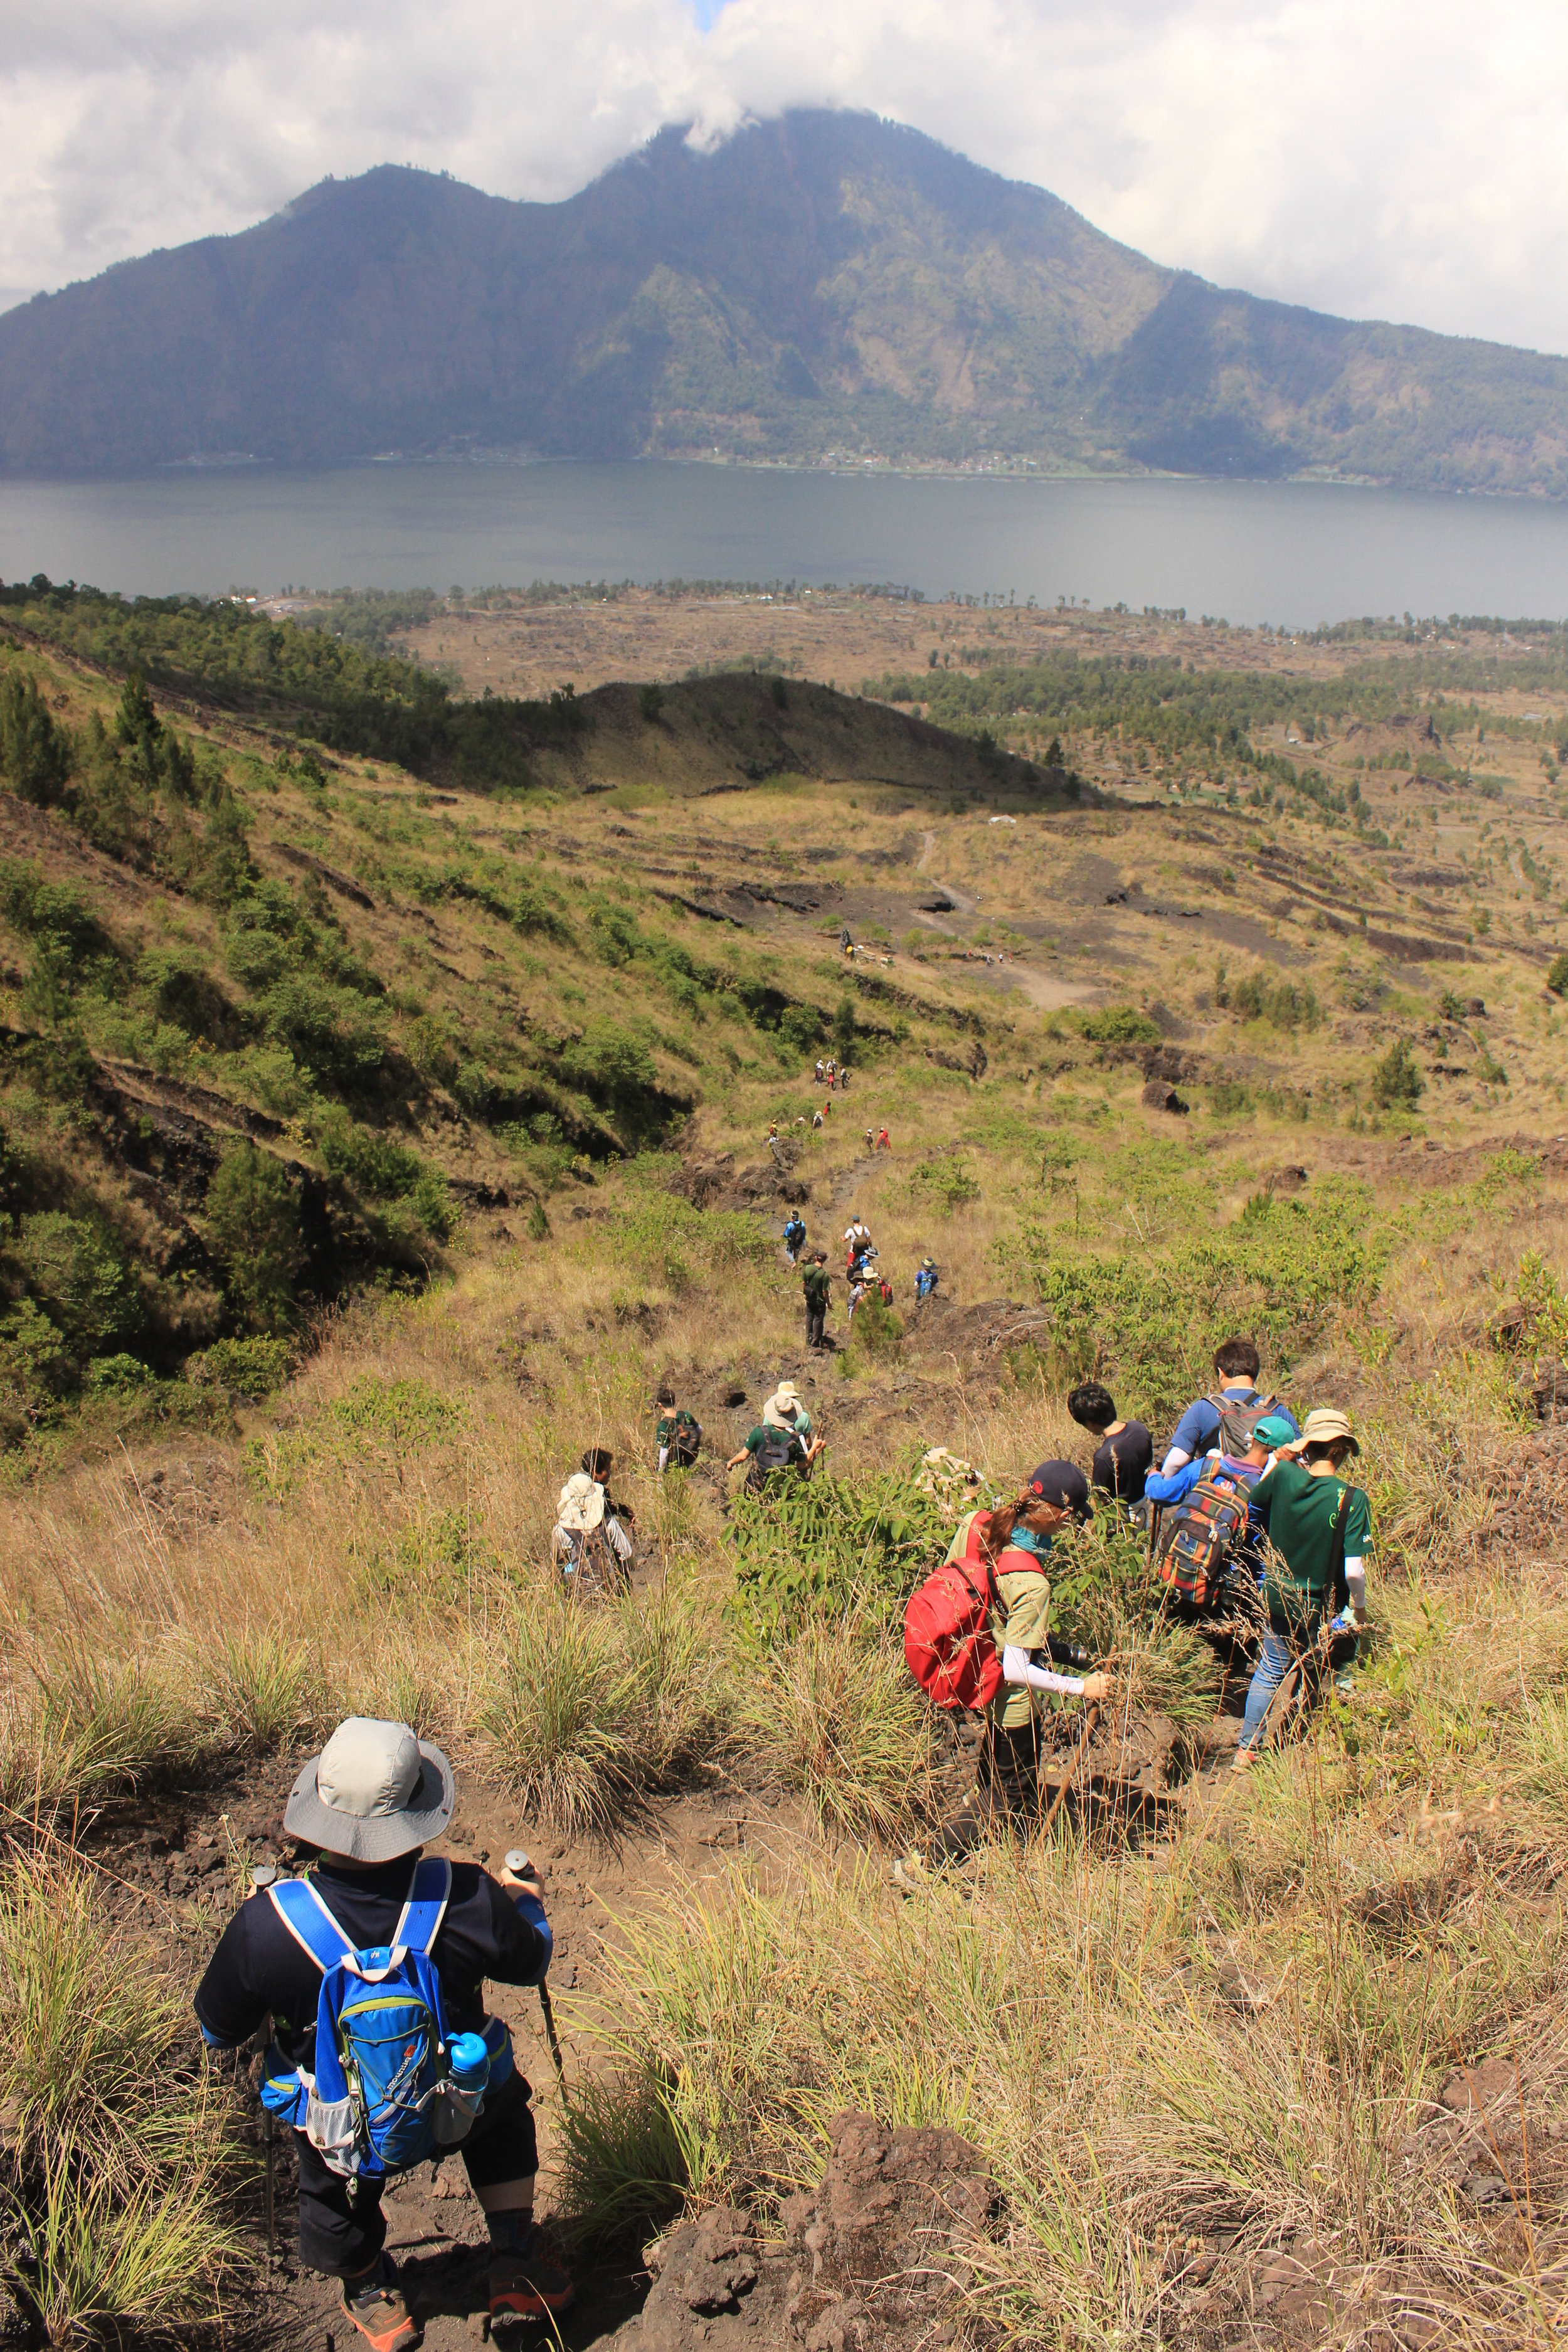 Bali, Mt Batur Trek, Trekking, Walking, Students, View, Scenery, Mountain, Lake GIST - Caltech.JPG